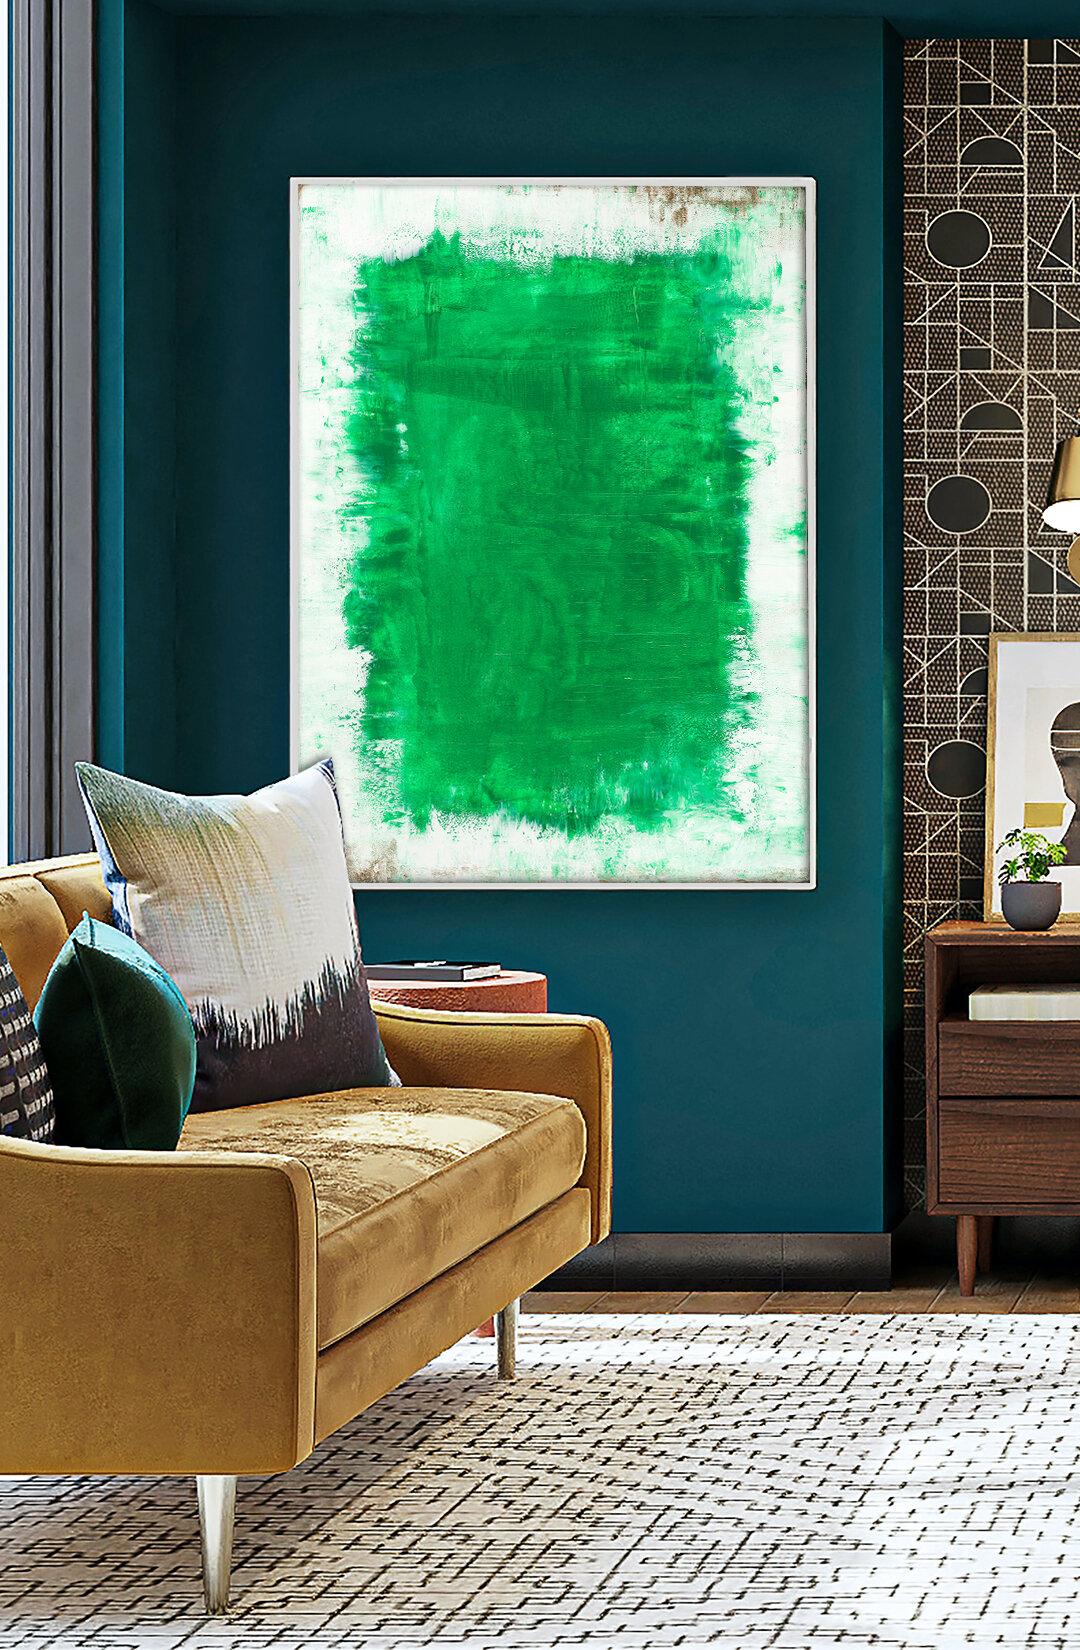 Wall decor inspiration minimalism home decor abstract art